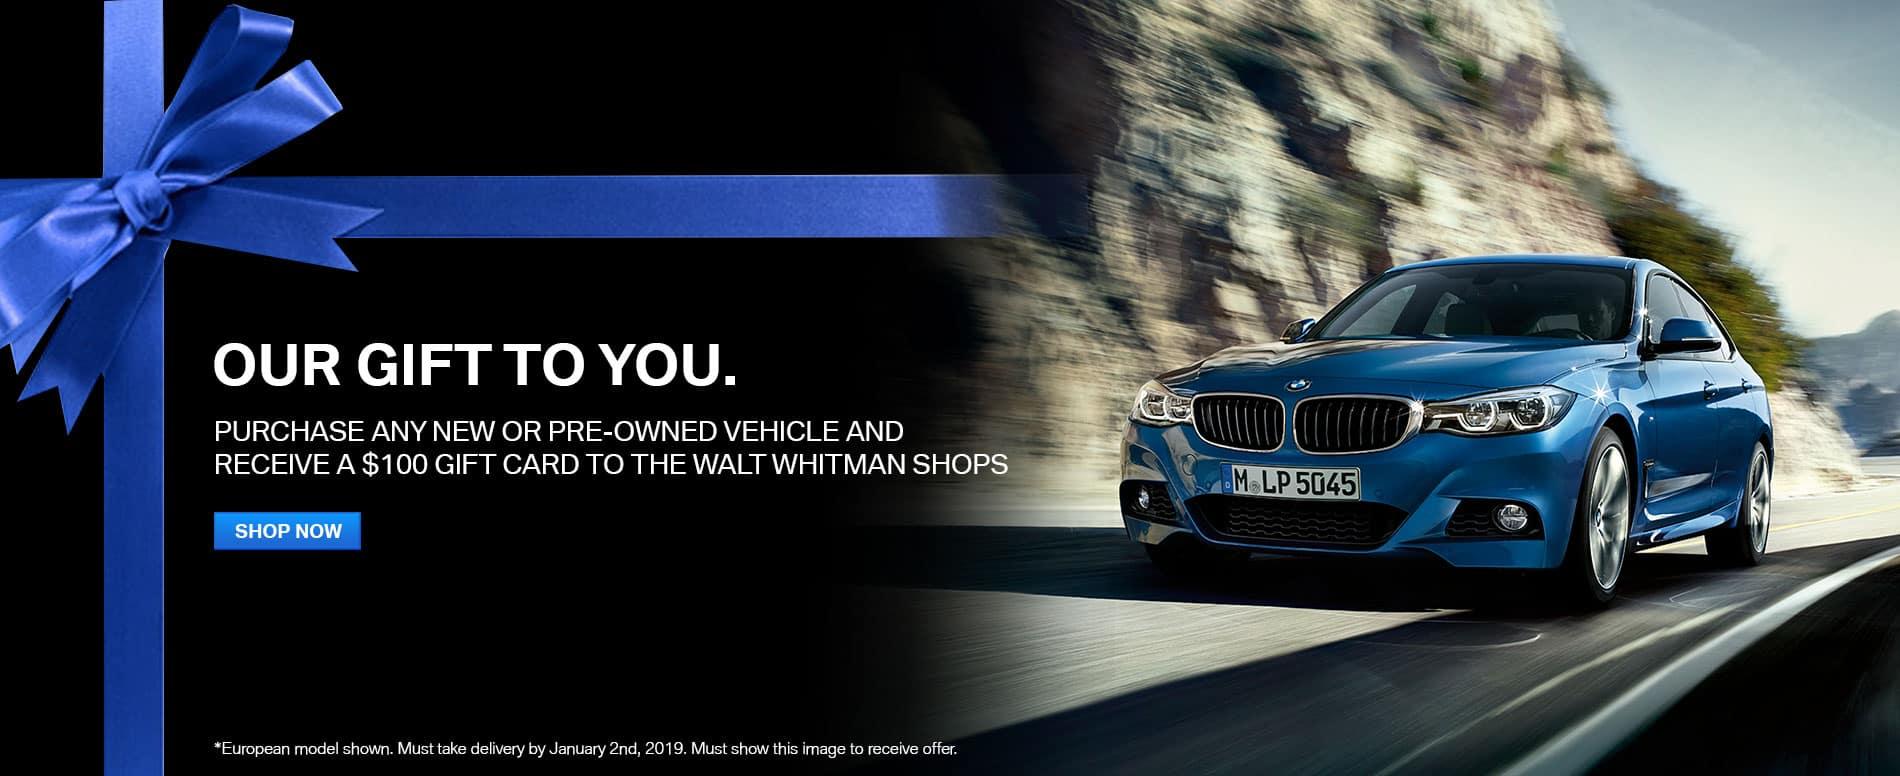 Habberstad BMW Walt Whitman Mall